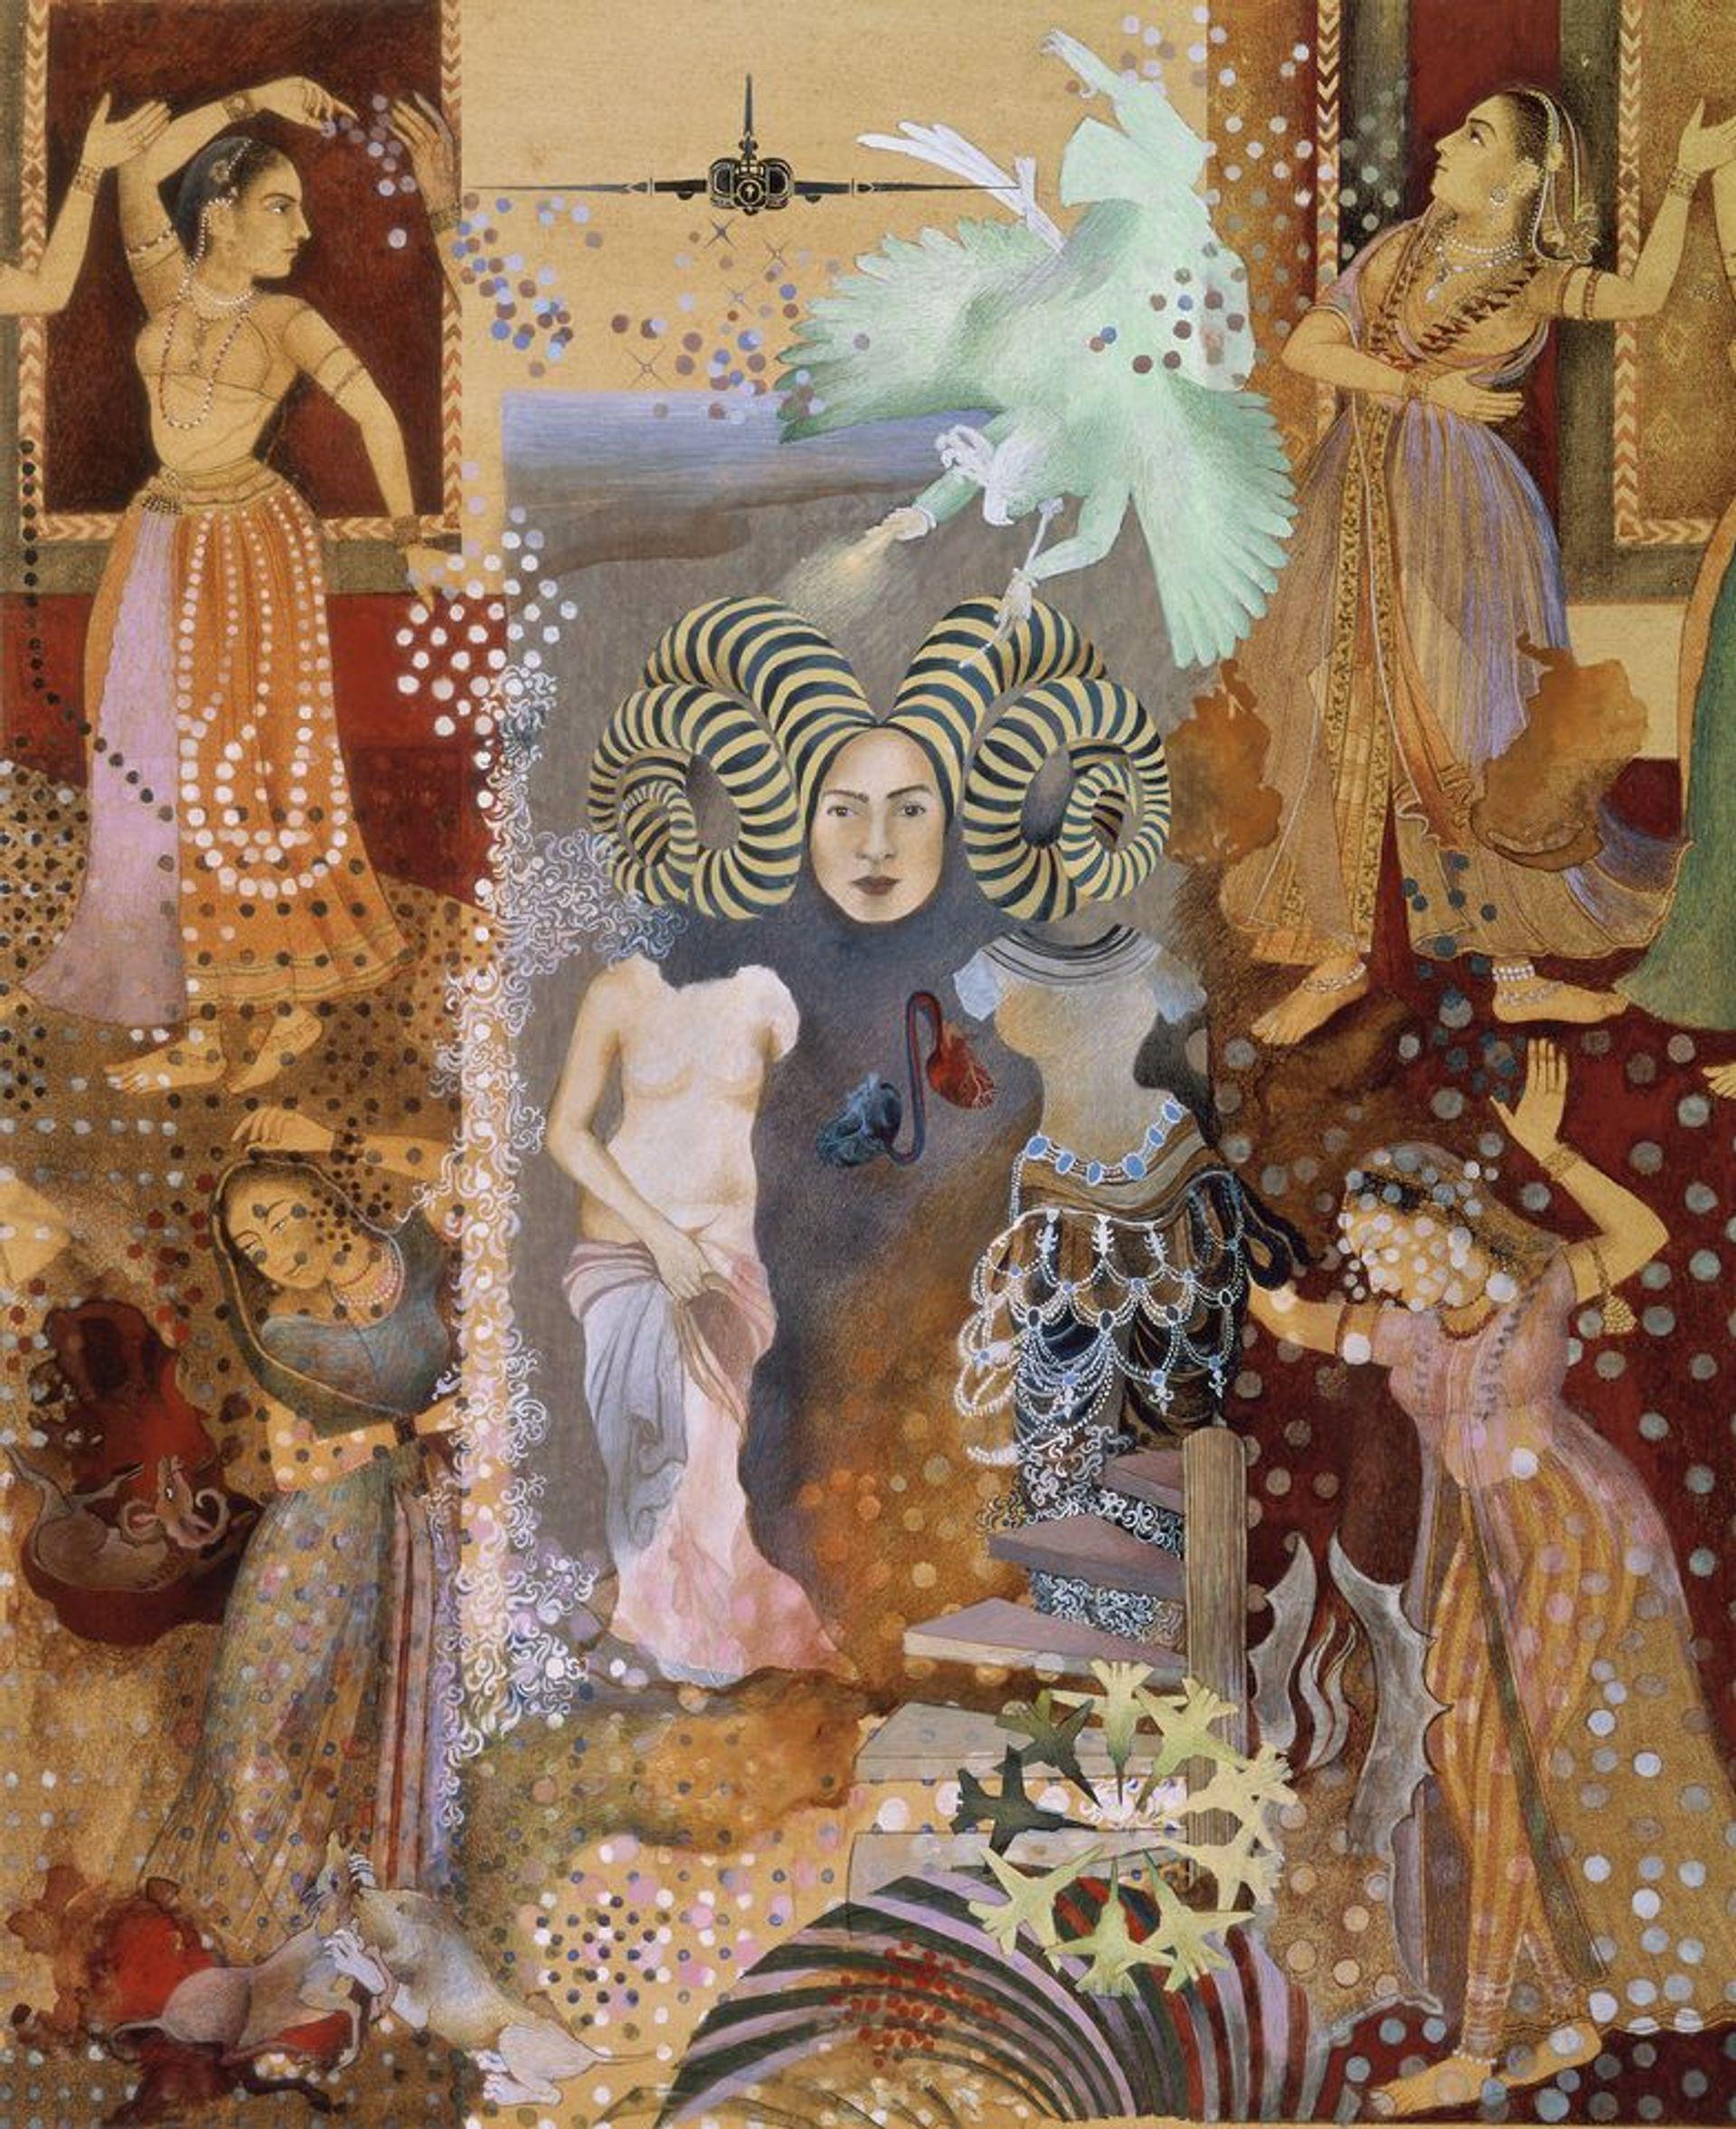 Shahzia Sikander, Pleasure Pillars (2001) © Shahzia Sikander